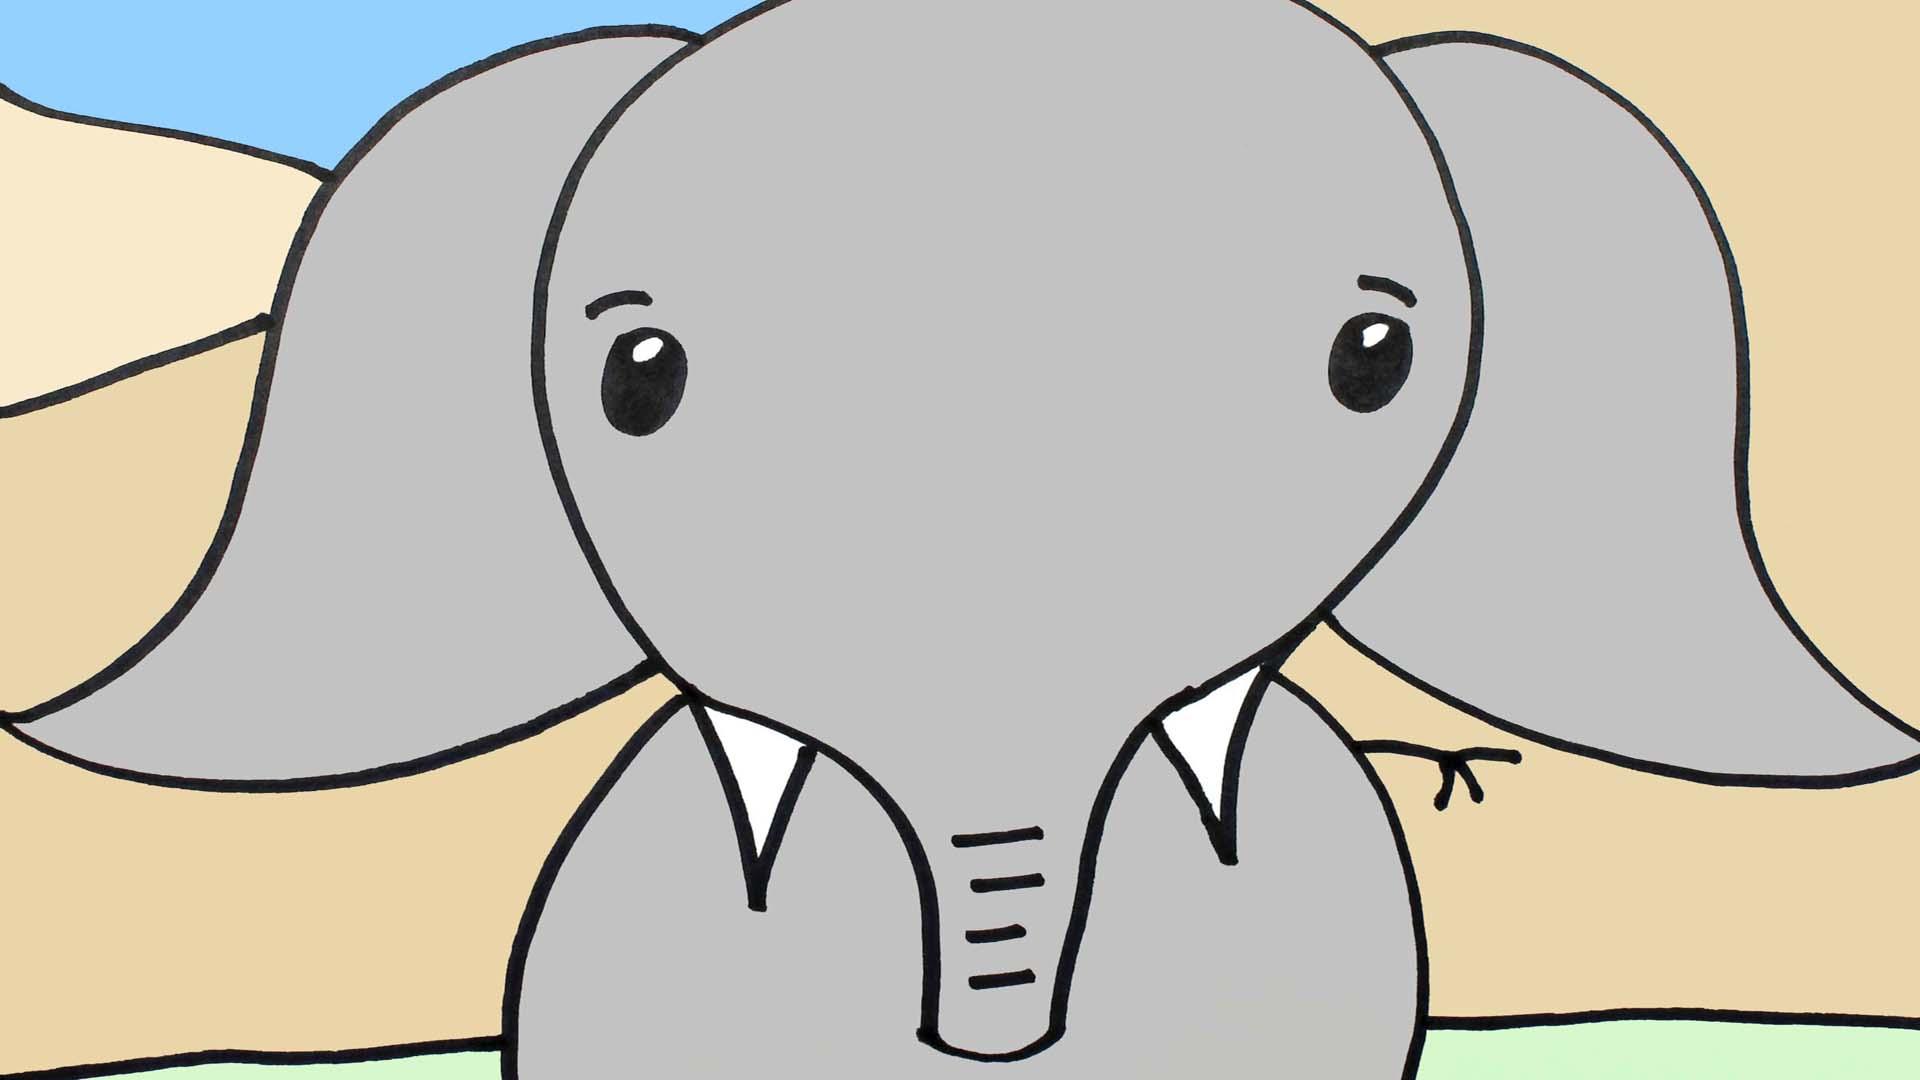 Amazon Com How To Draw An Elephant Video Drawing Lesson Em Winn Em Winn